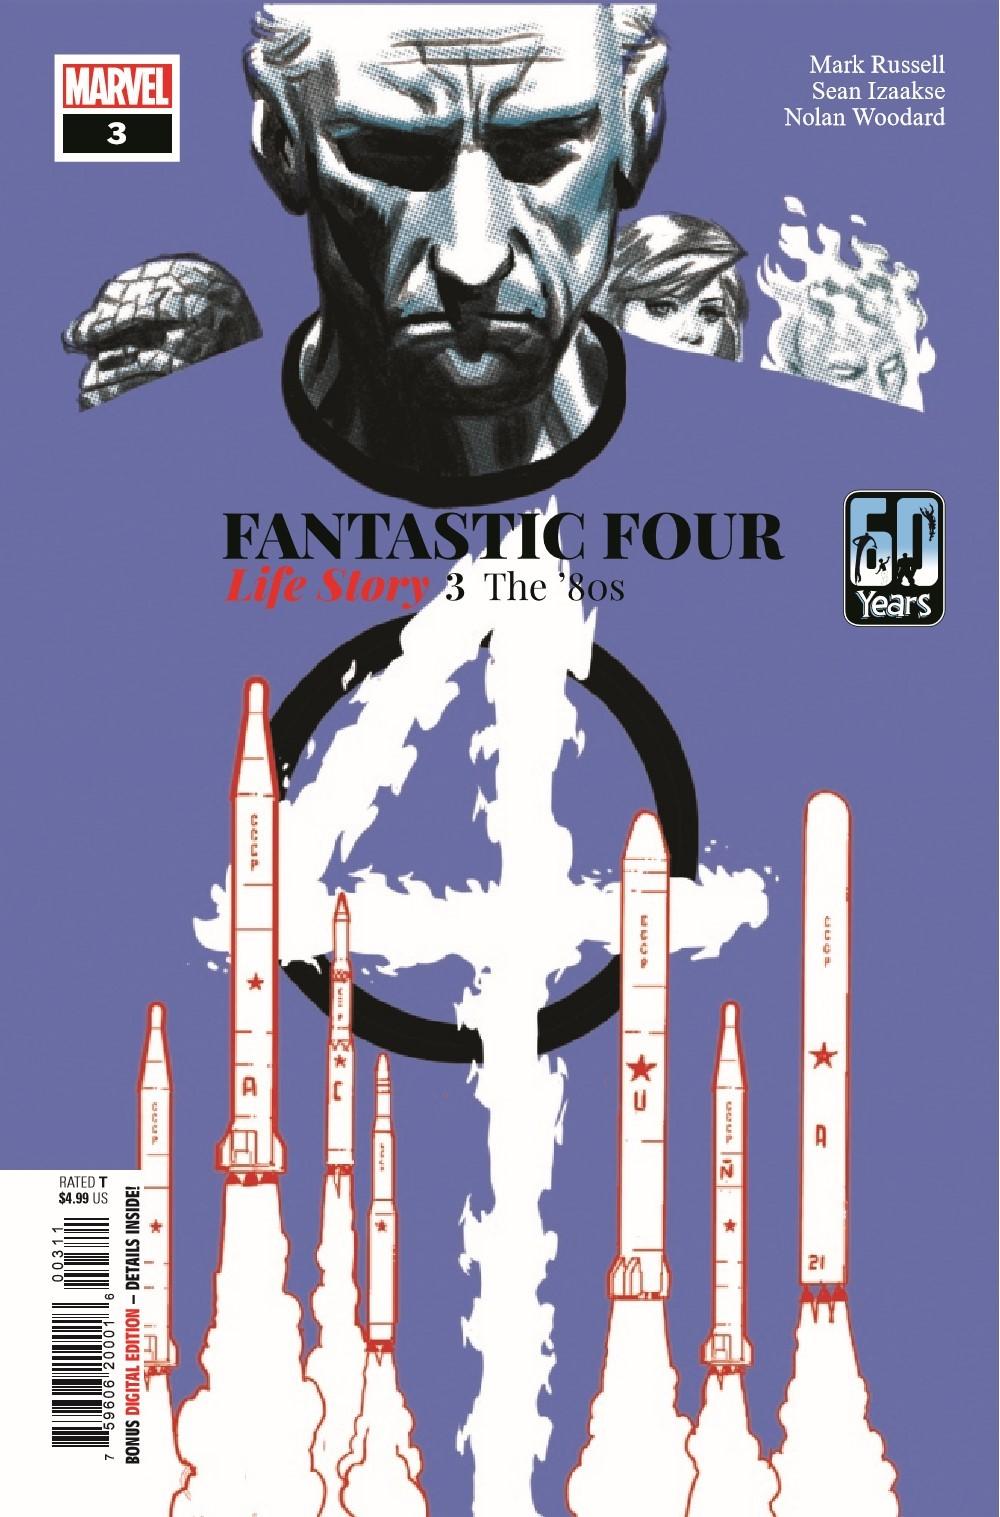 FFLIFESTORY2019003_Preview-1 ComicList Previews: FANTASTIC FOUR LIFE STORY #3 (OF 6)